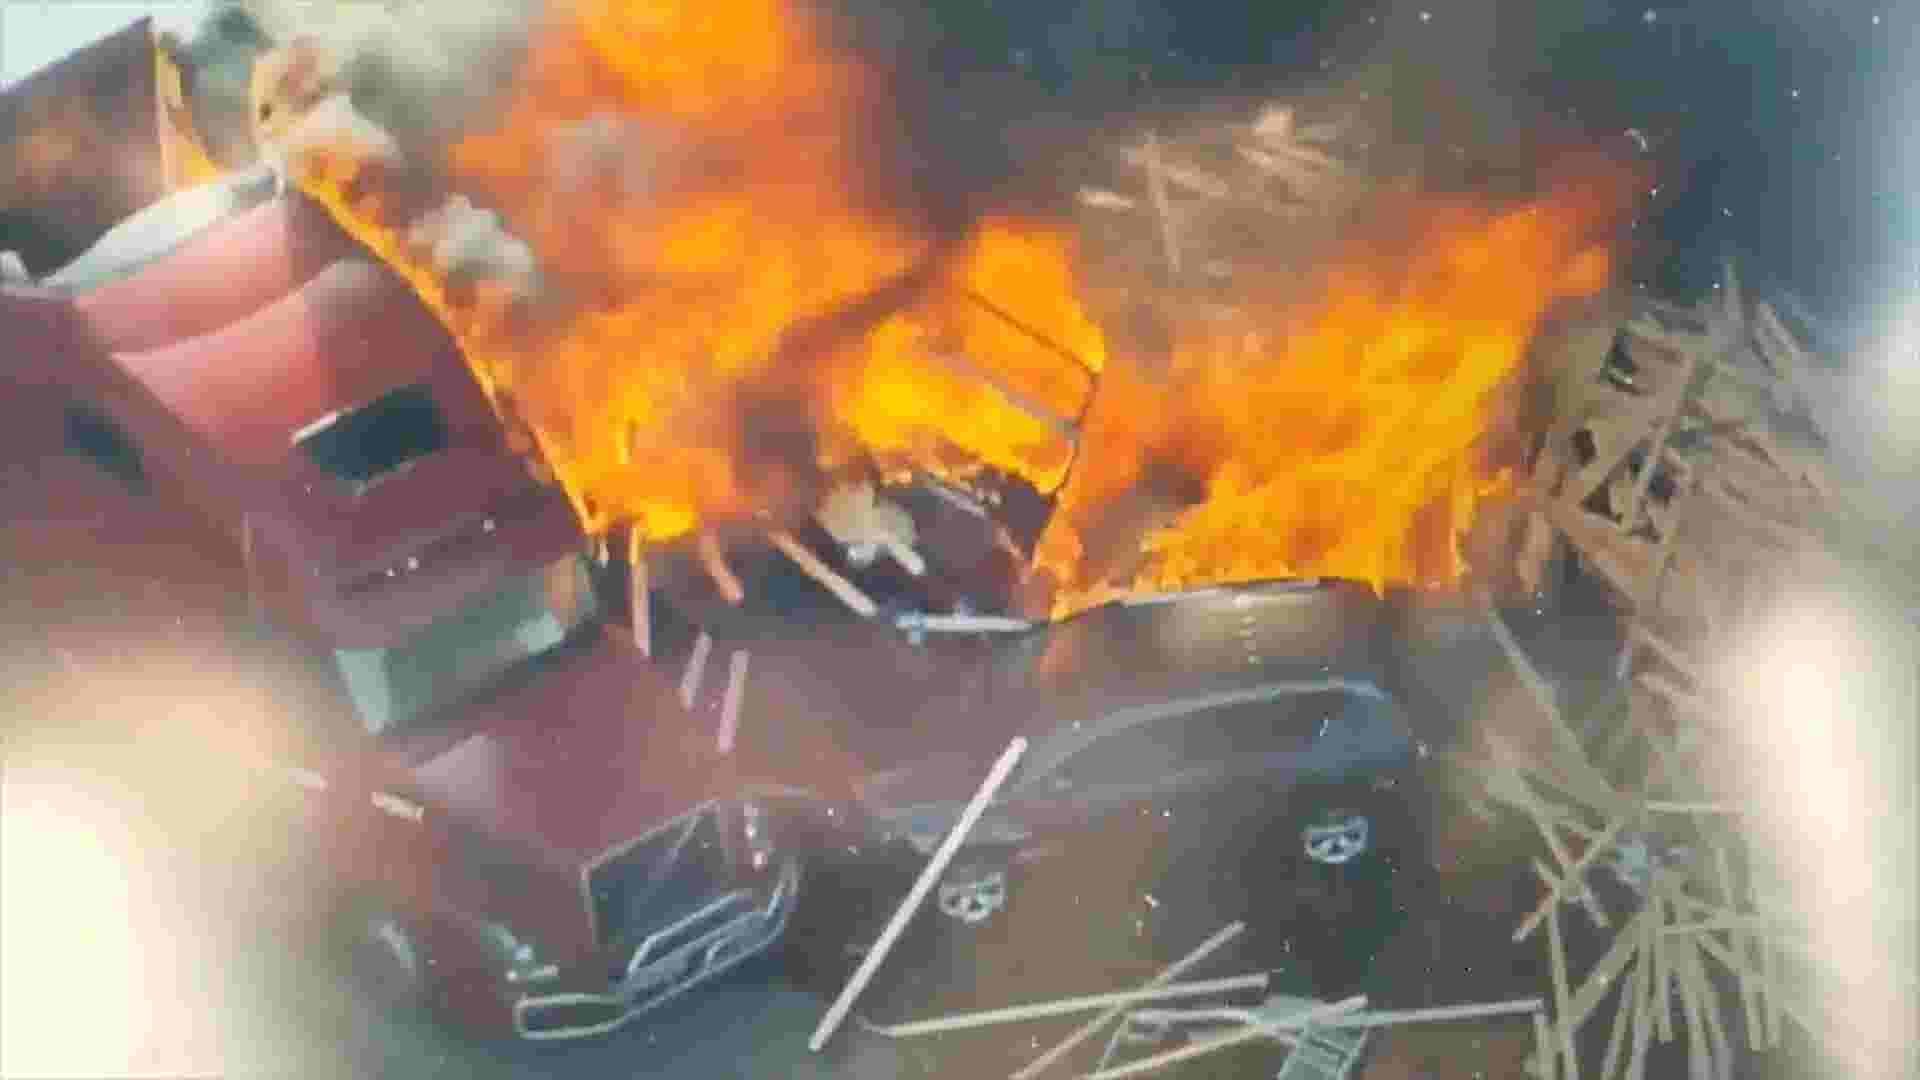 Semi driver taken into custody after fiery I-70 pileup near Denver